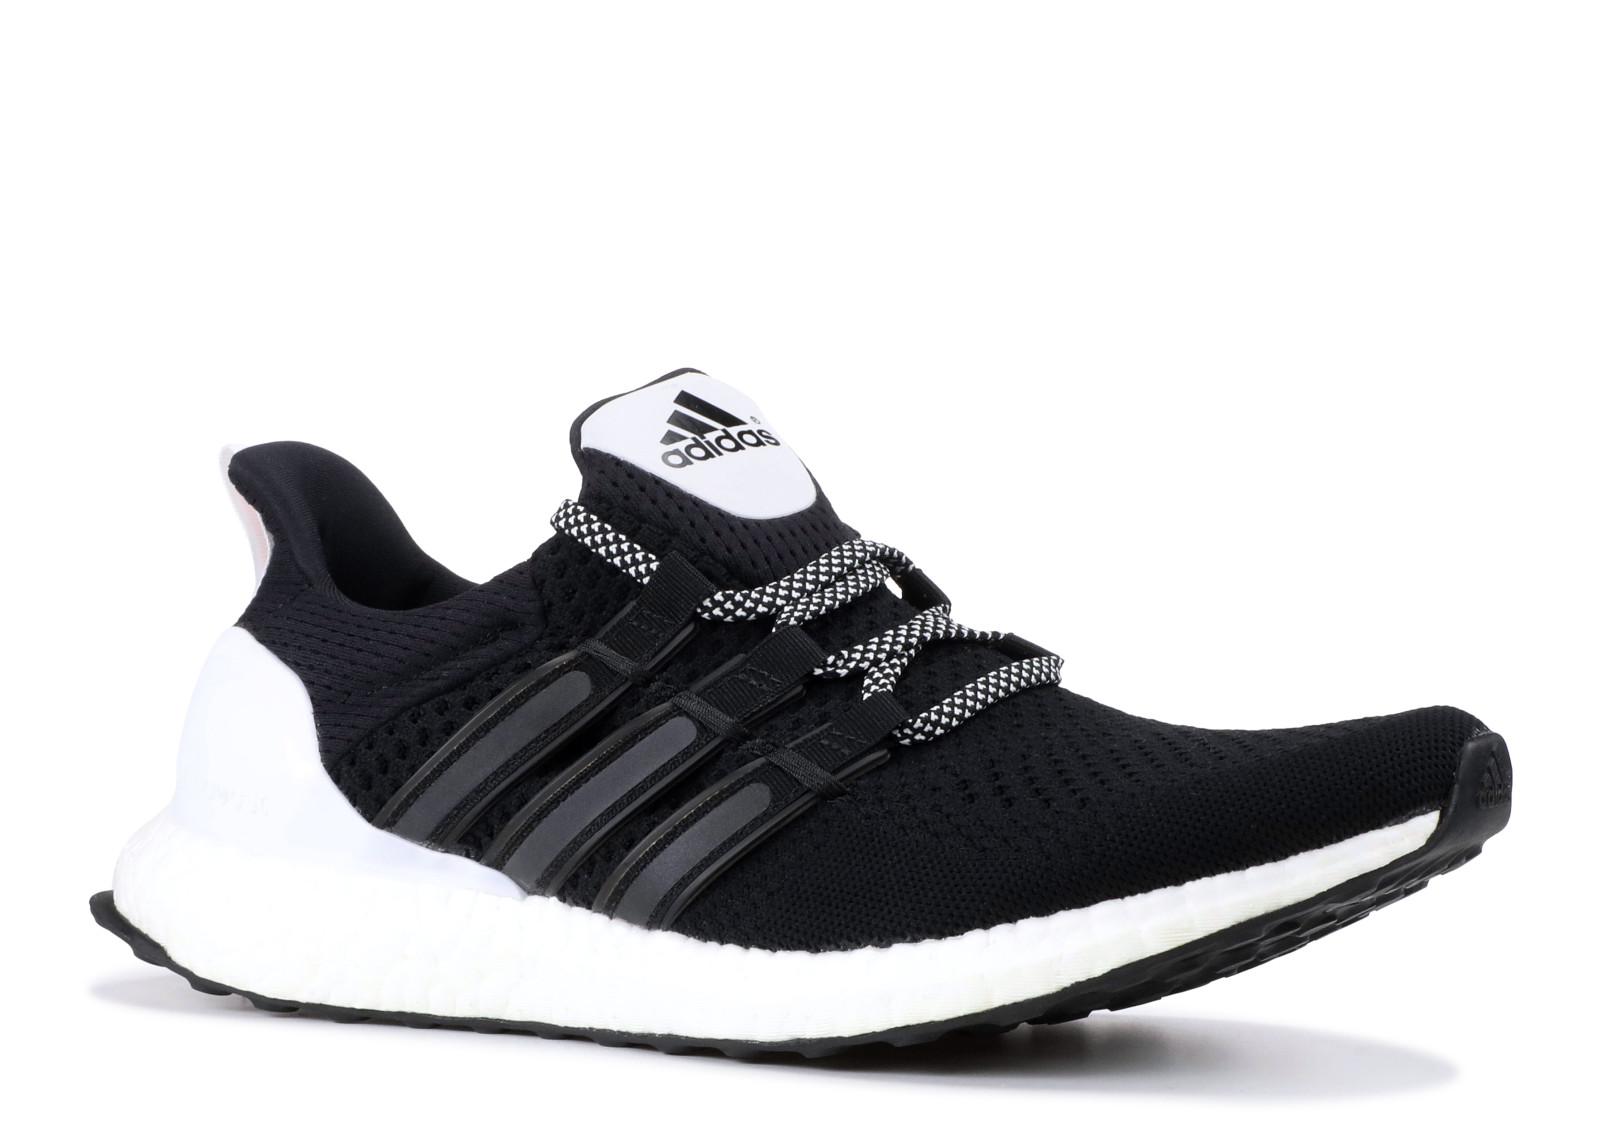 on sale 74fc7 b57b9 Kick Avenue - Authentic Sneakers